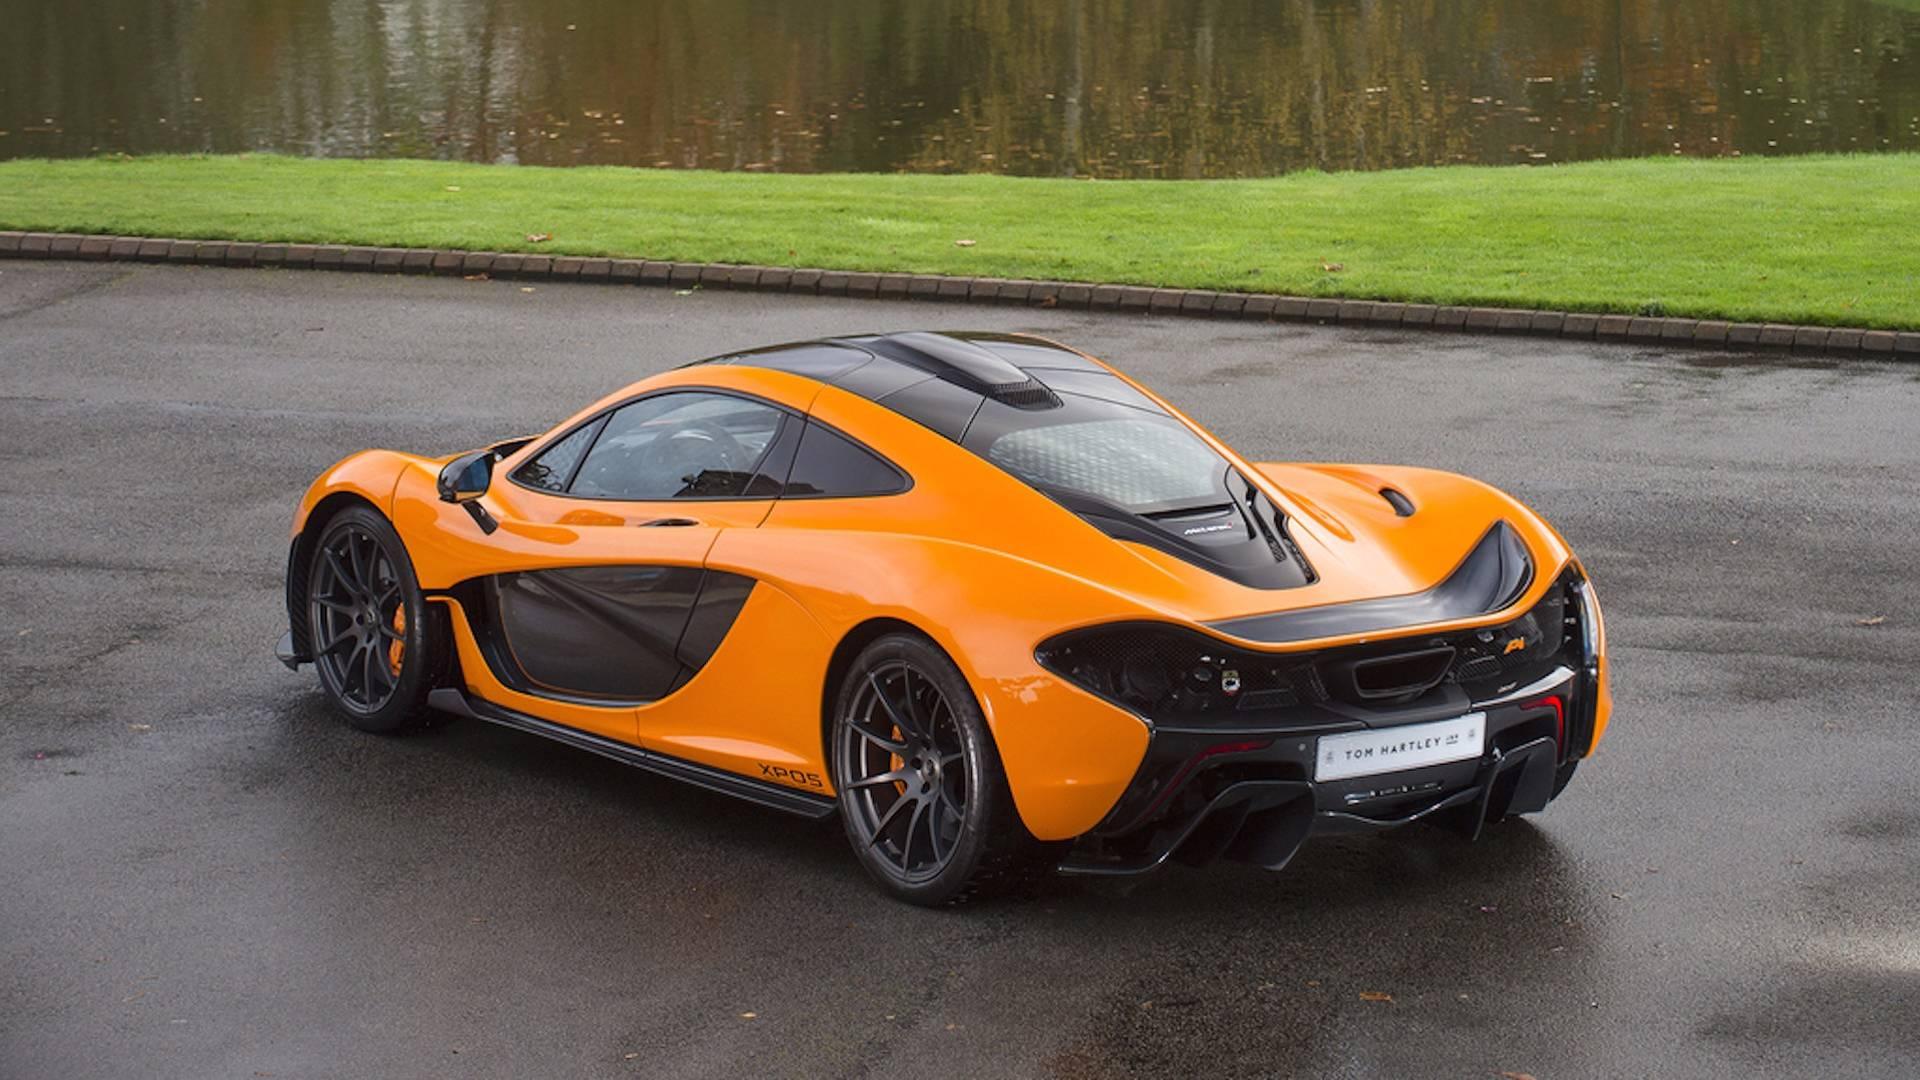 McLaren_P1_Experimental_Prototype_04